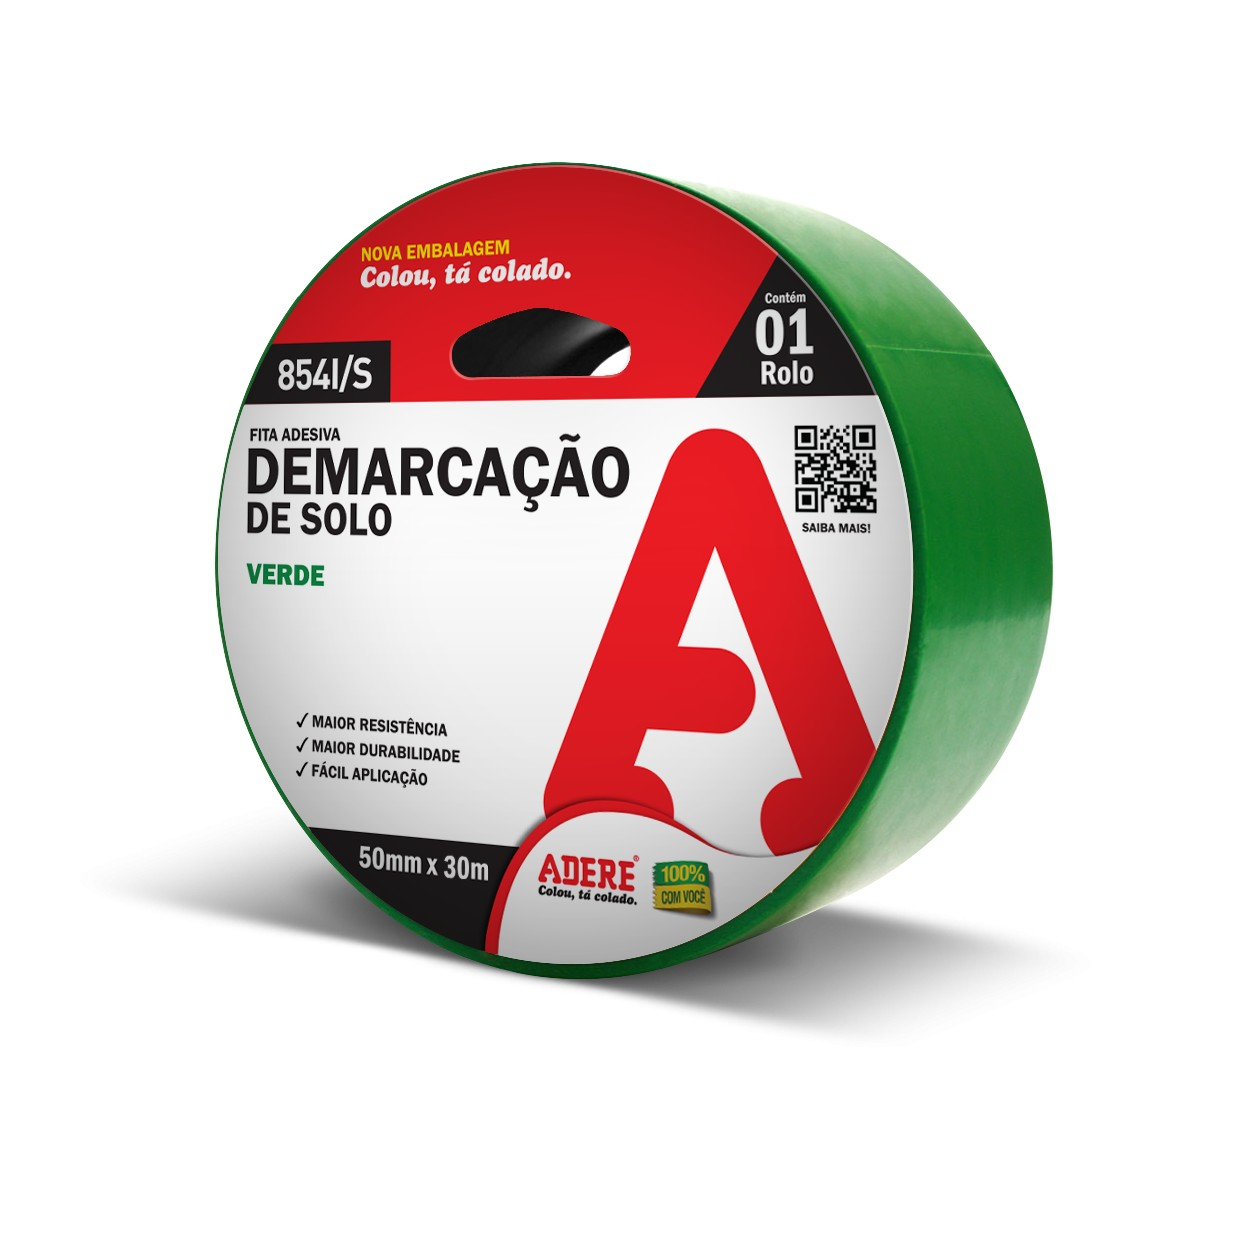 Fita Adesiva Demarcacao 50mm x 30m Verde 1 Unidade - Adere